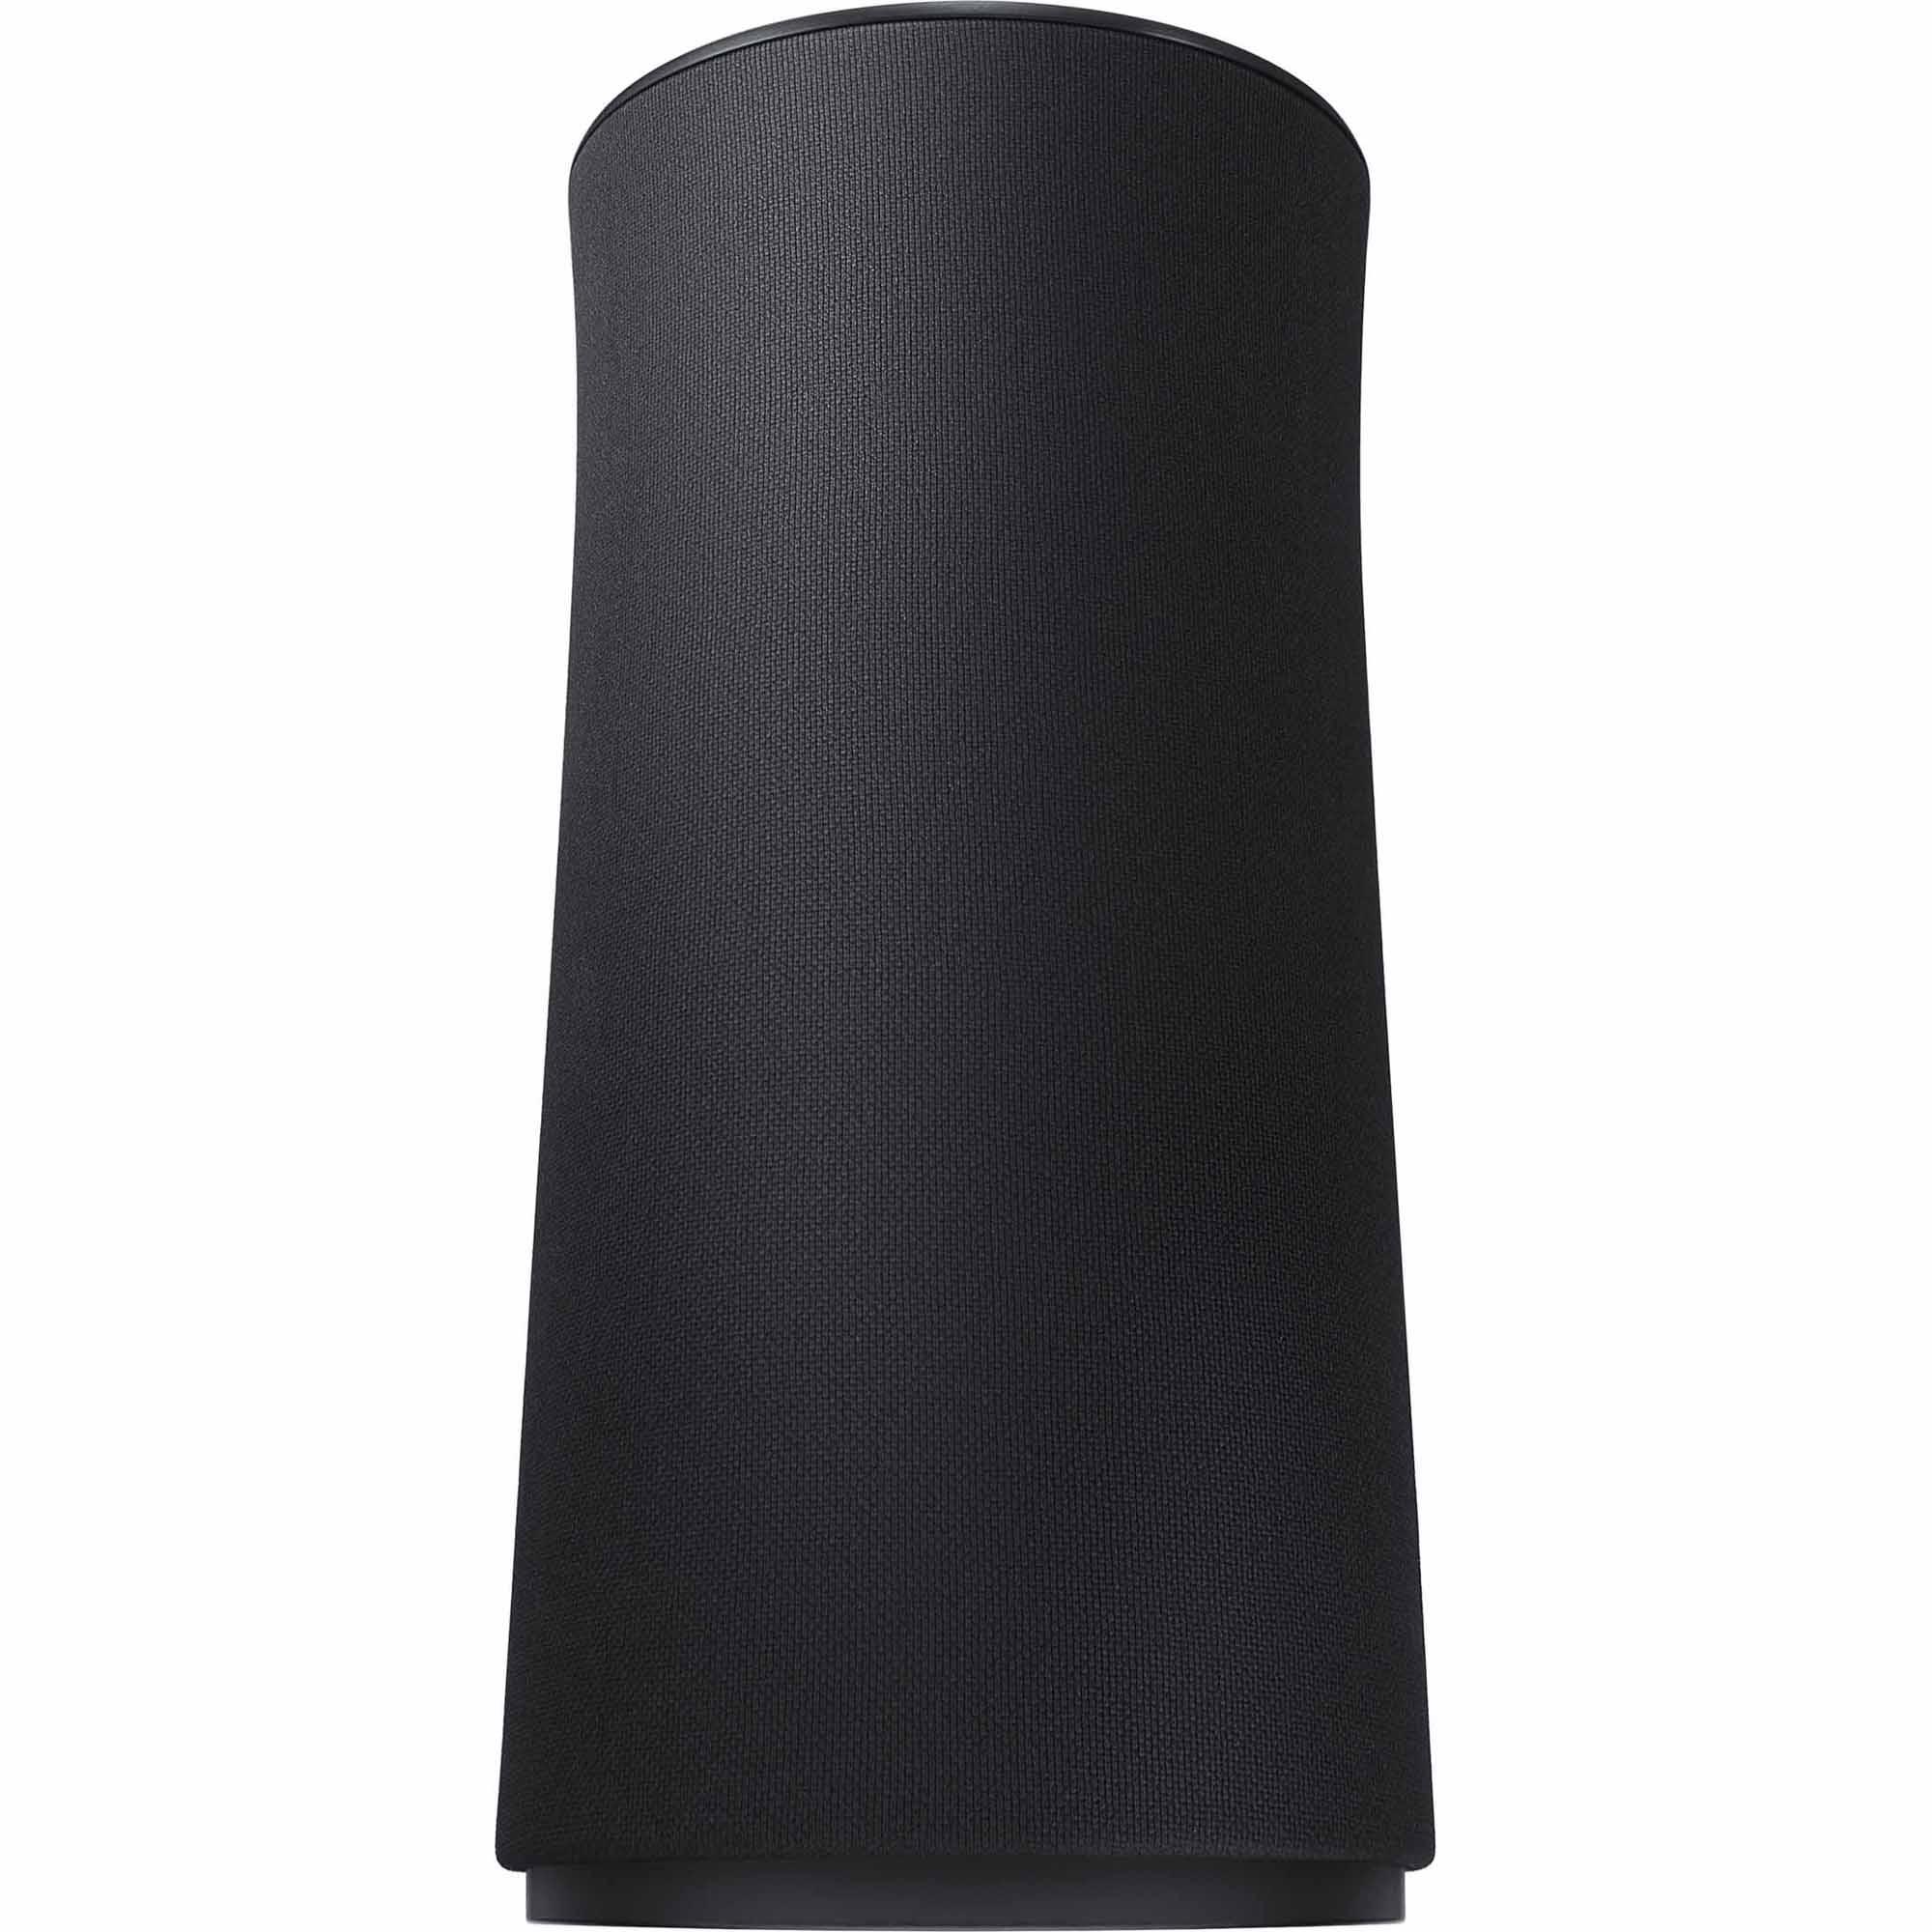 Samsung Radiant360 R1 WiFi/Bluetooth Speaker - WAM-1500